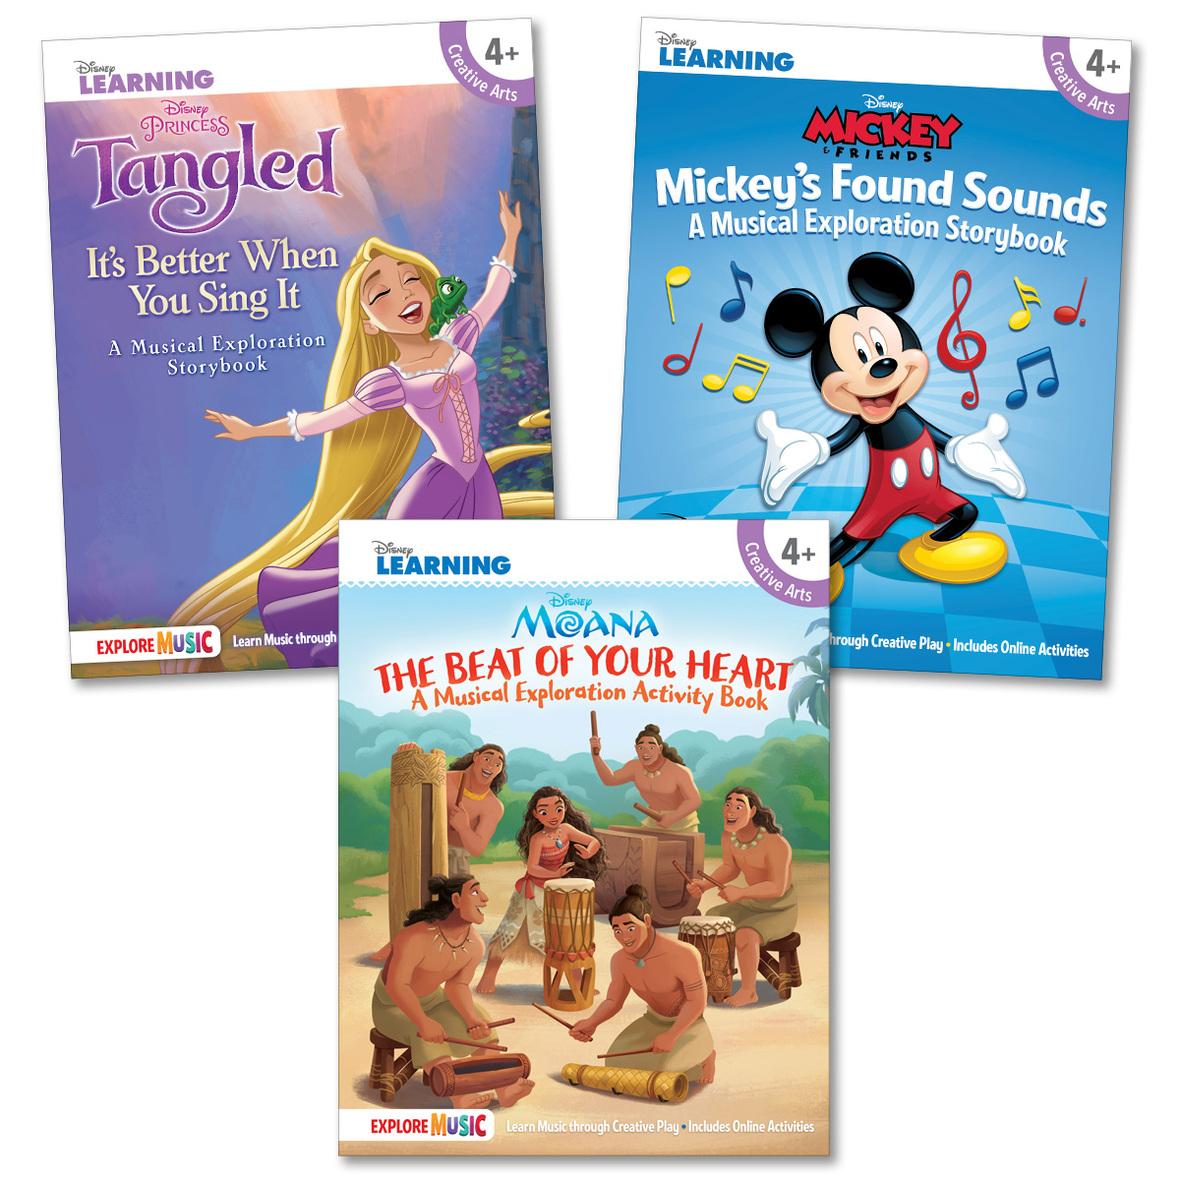 DisneyLearning